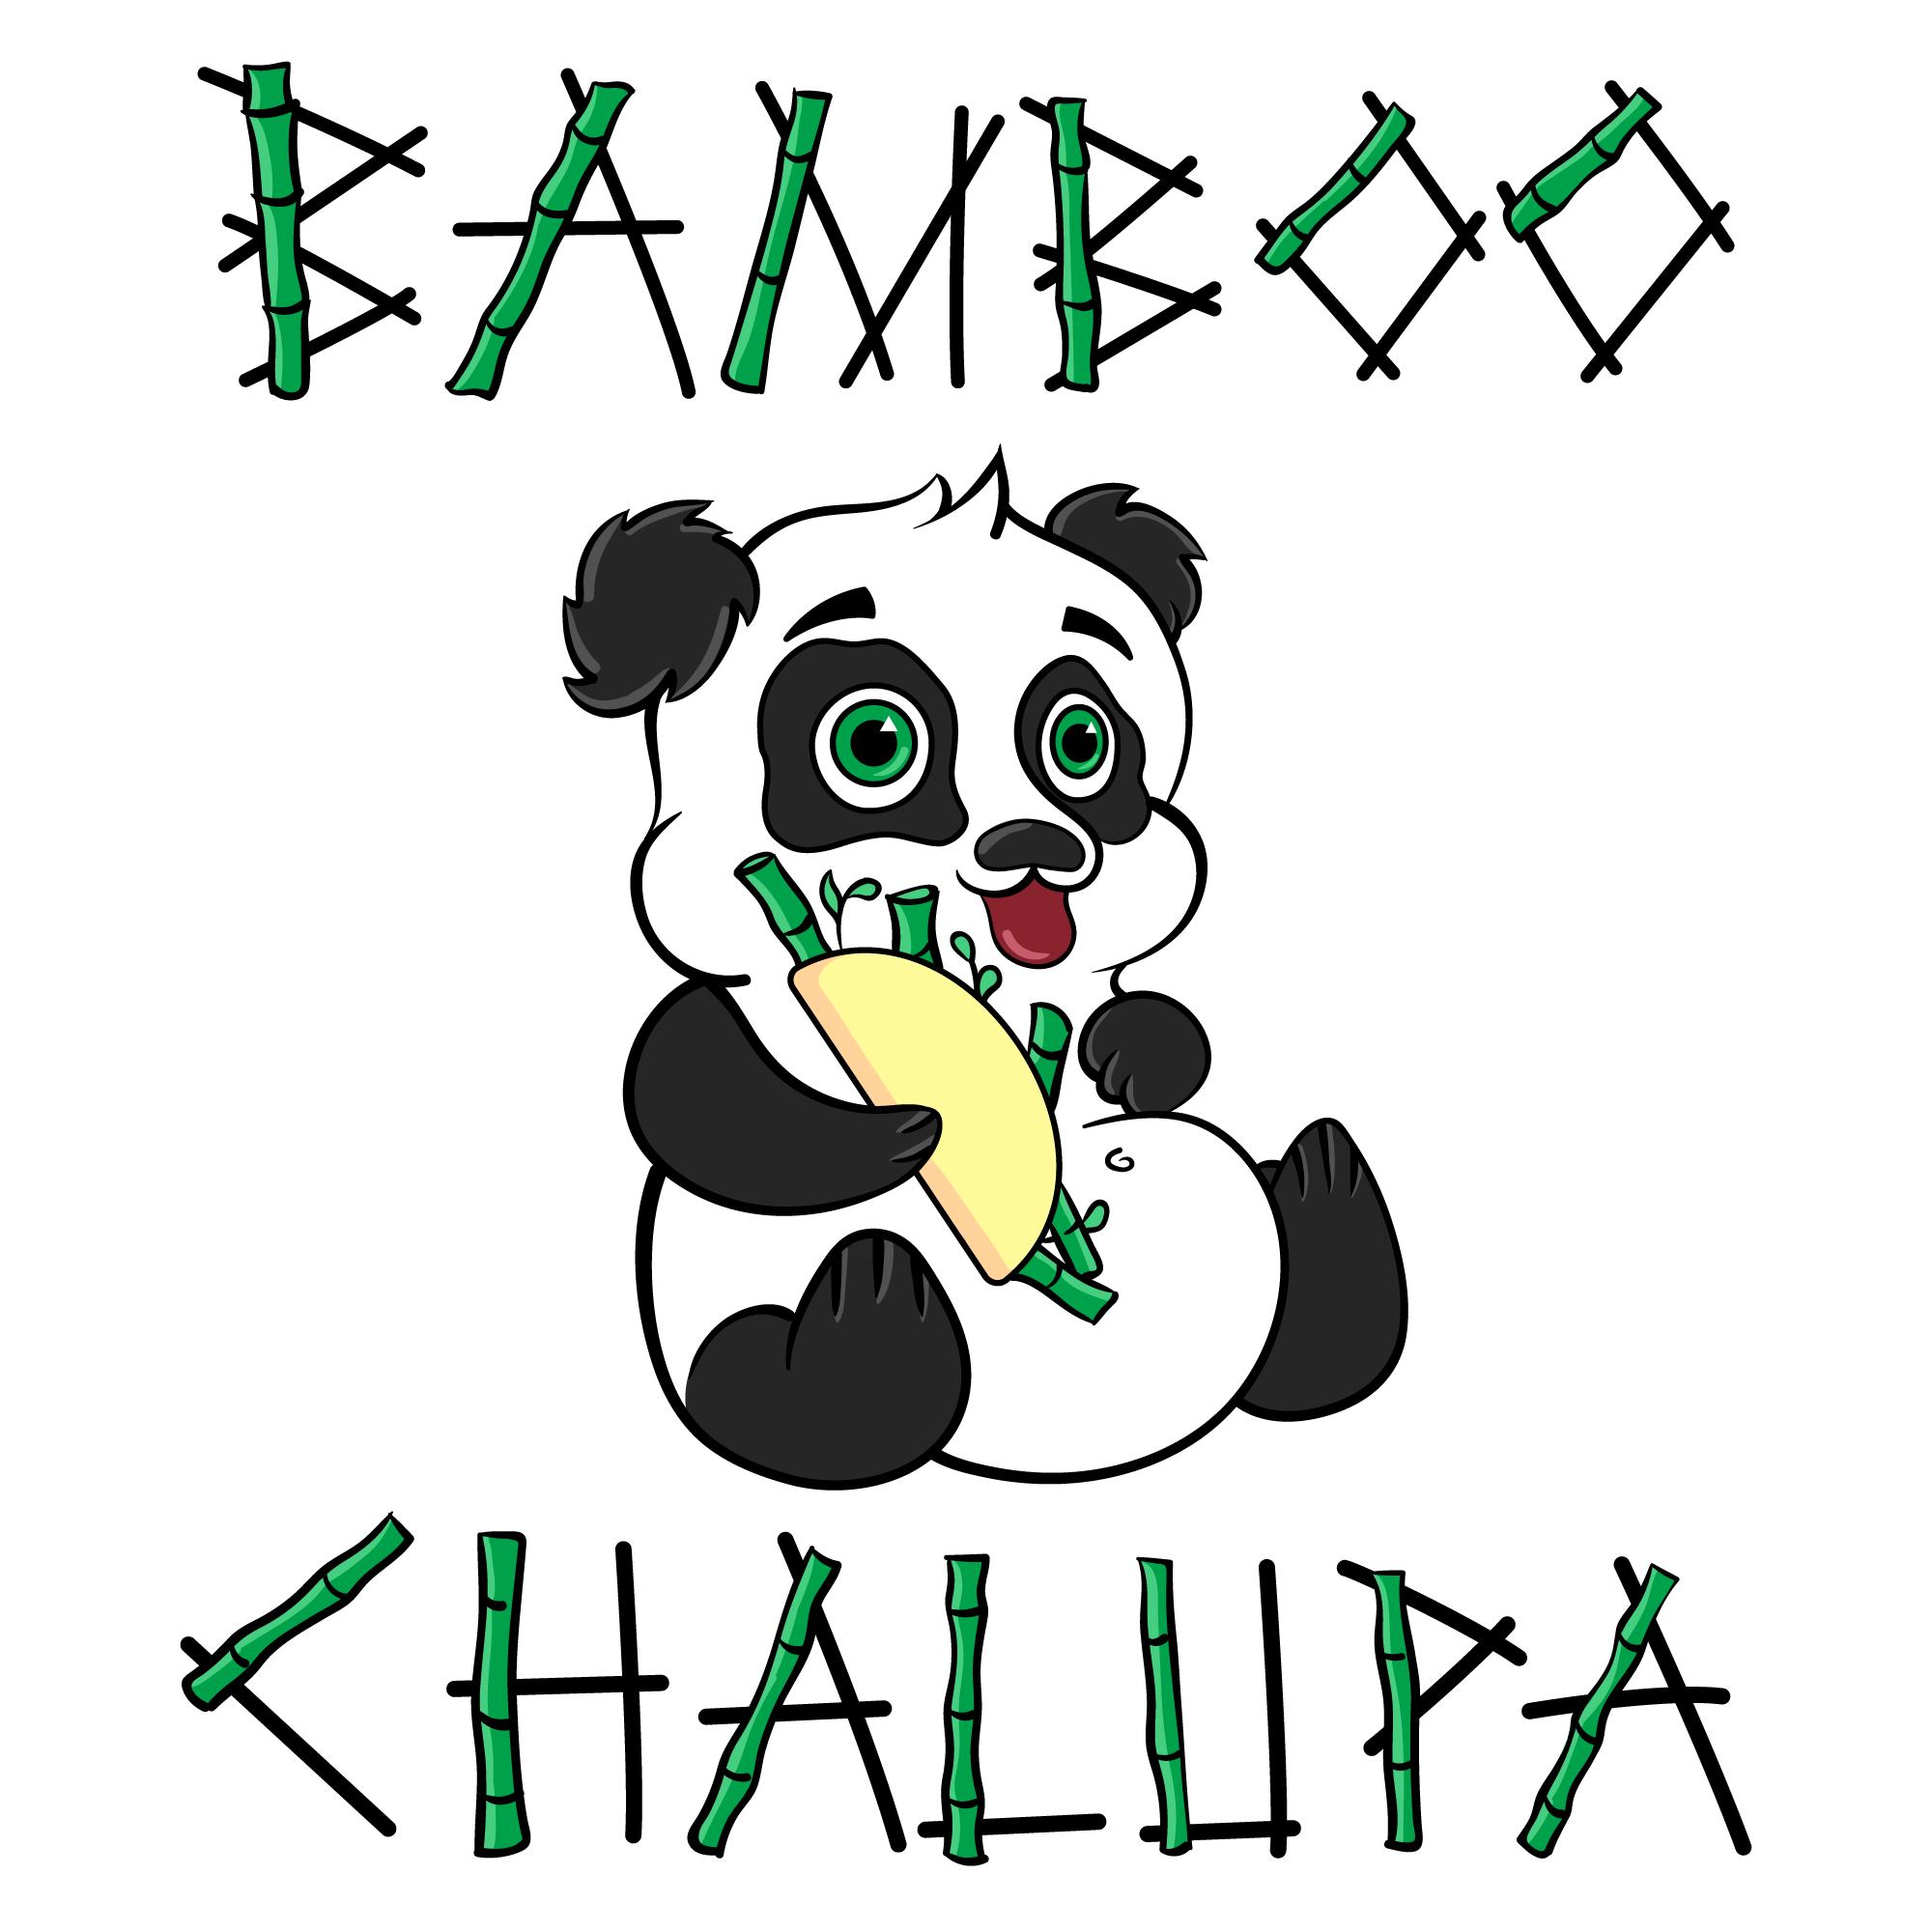 Bamboo Chalupa Digital Marketing Podcast show art